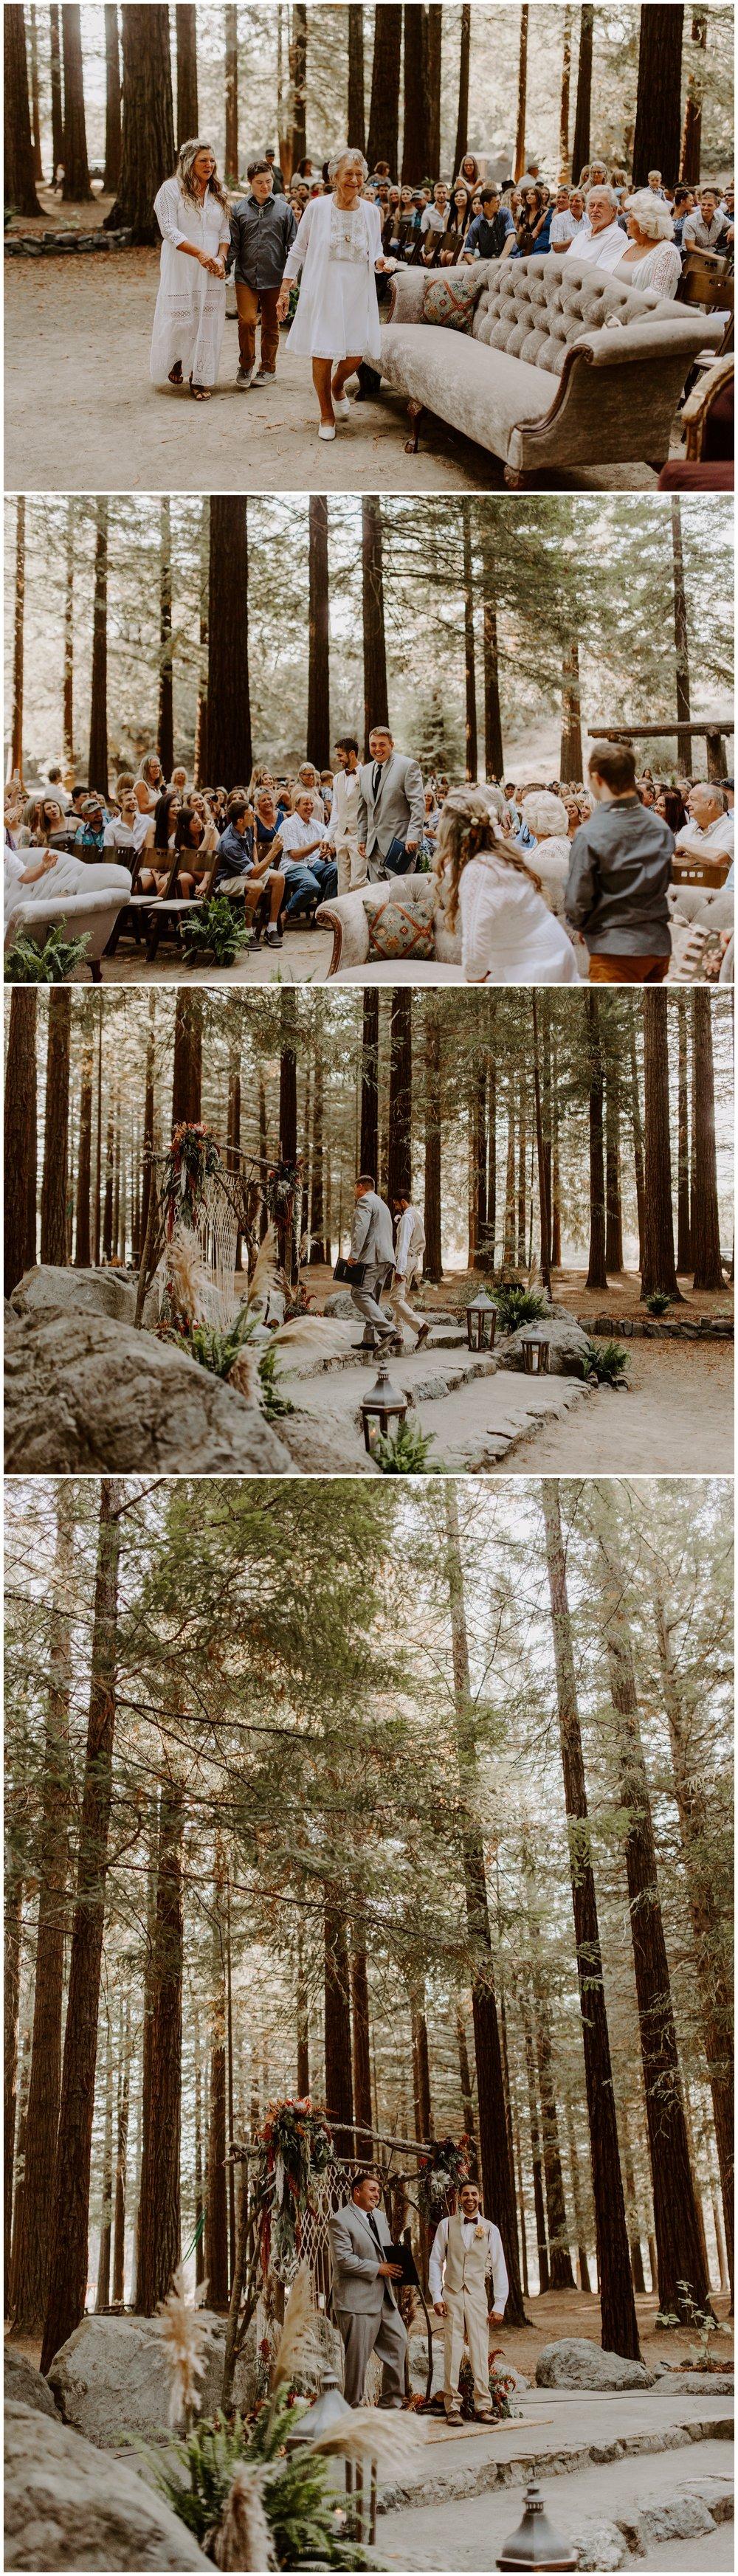 Redwood Festival Wedding Humbolt California - Jessica Heron Images_0031.jpg